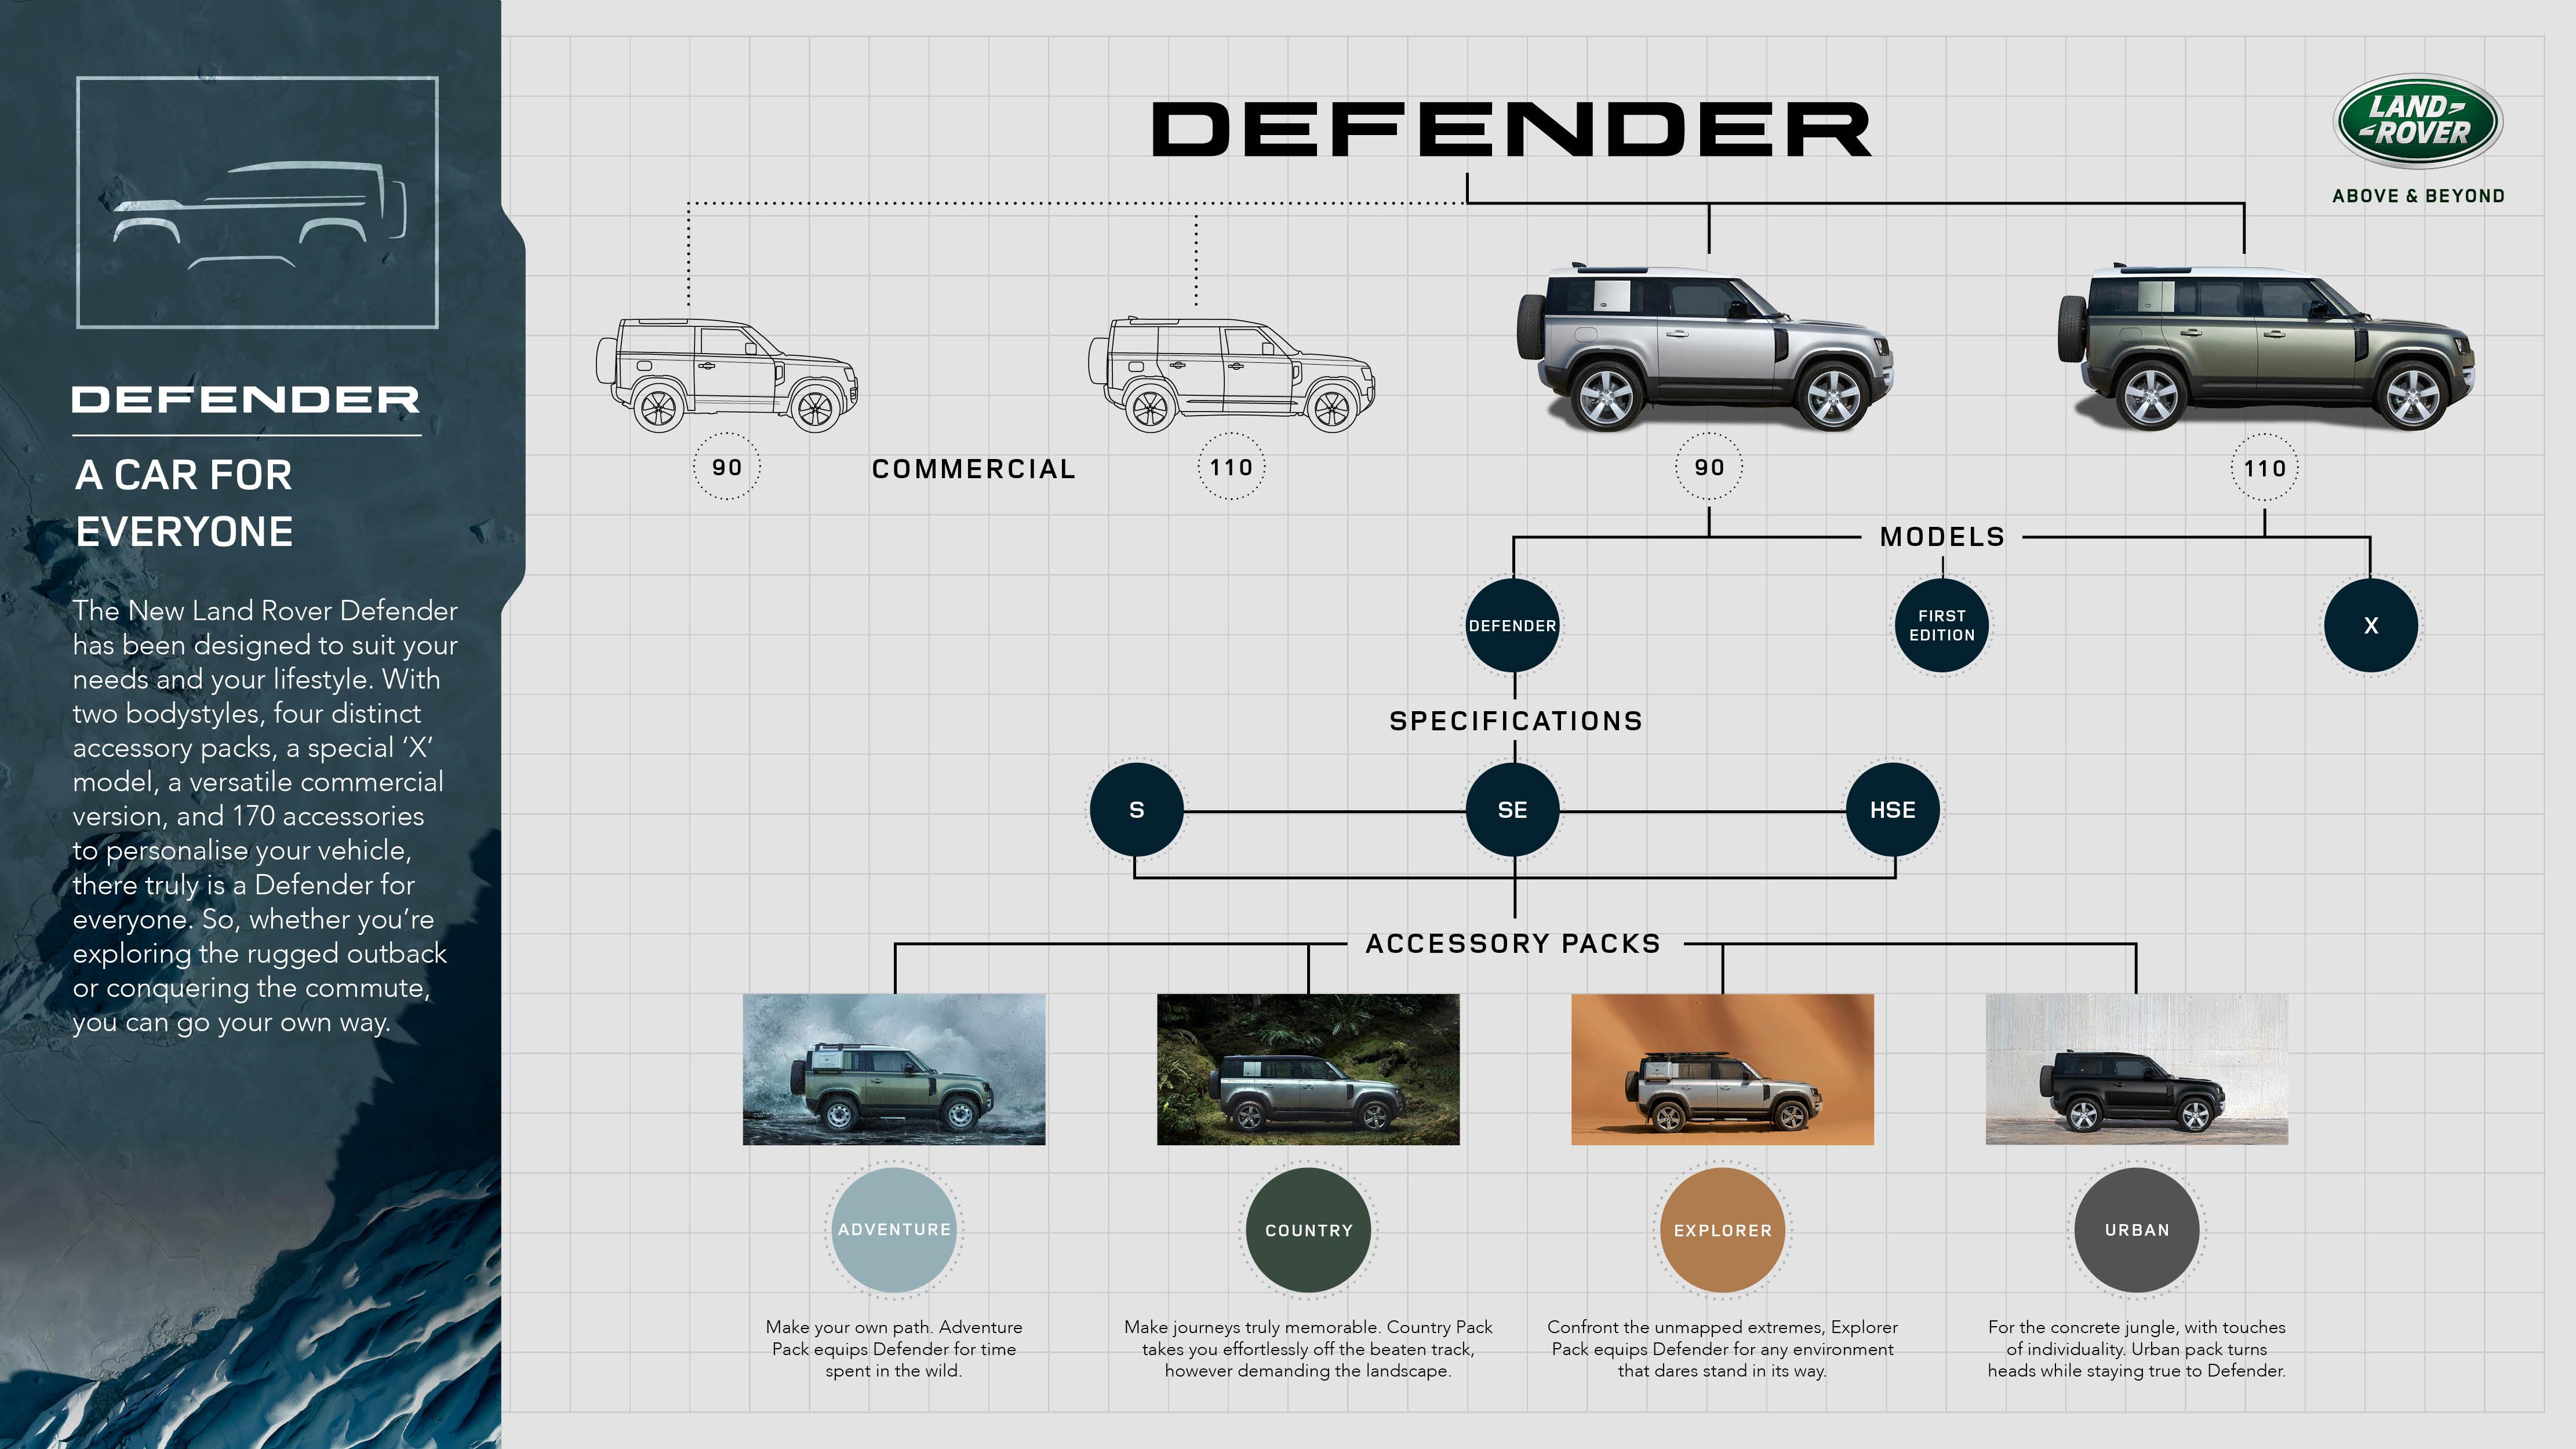 11.DefenderFamily_Infographic_Wide_100919